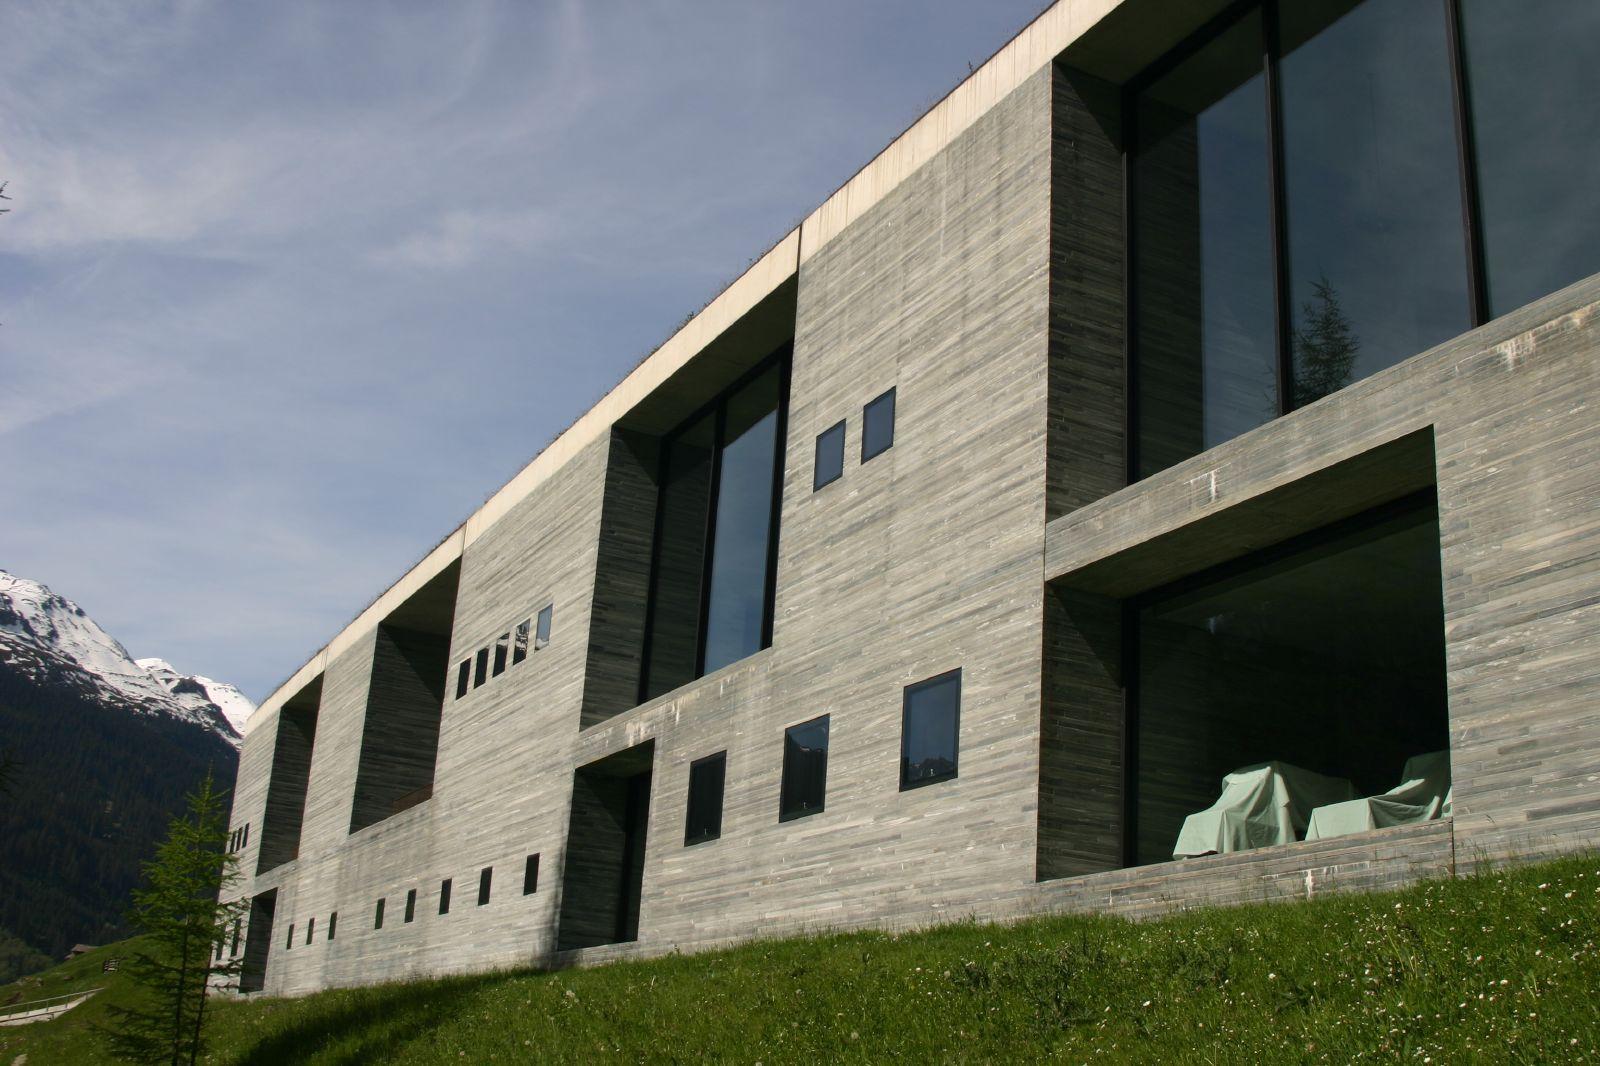 Peter Zumthor, Termas de Vals architecture Pinterest